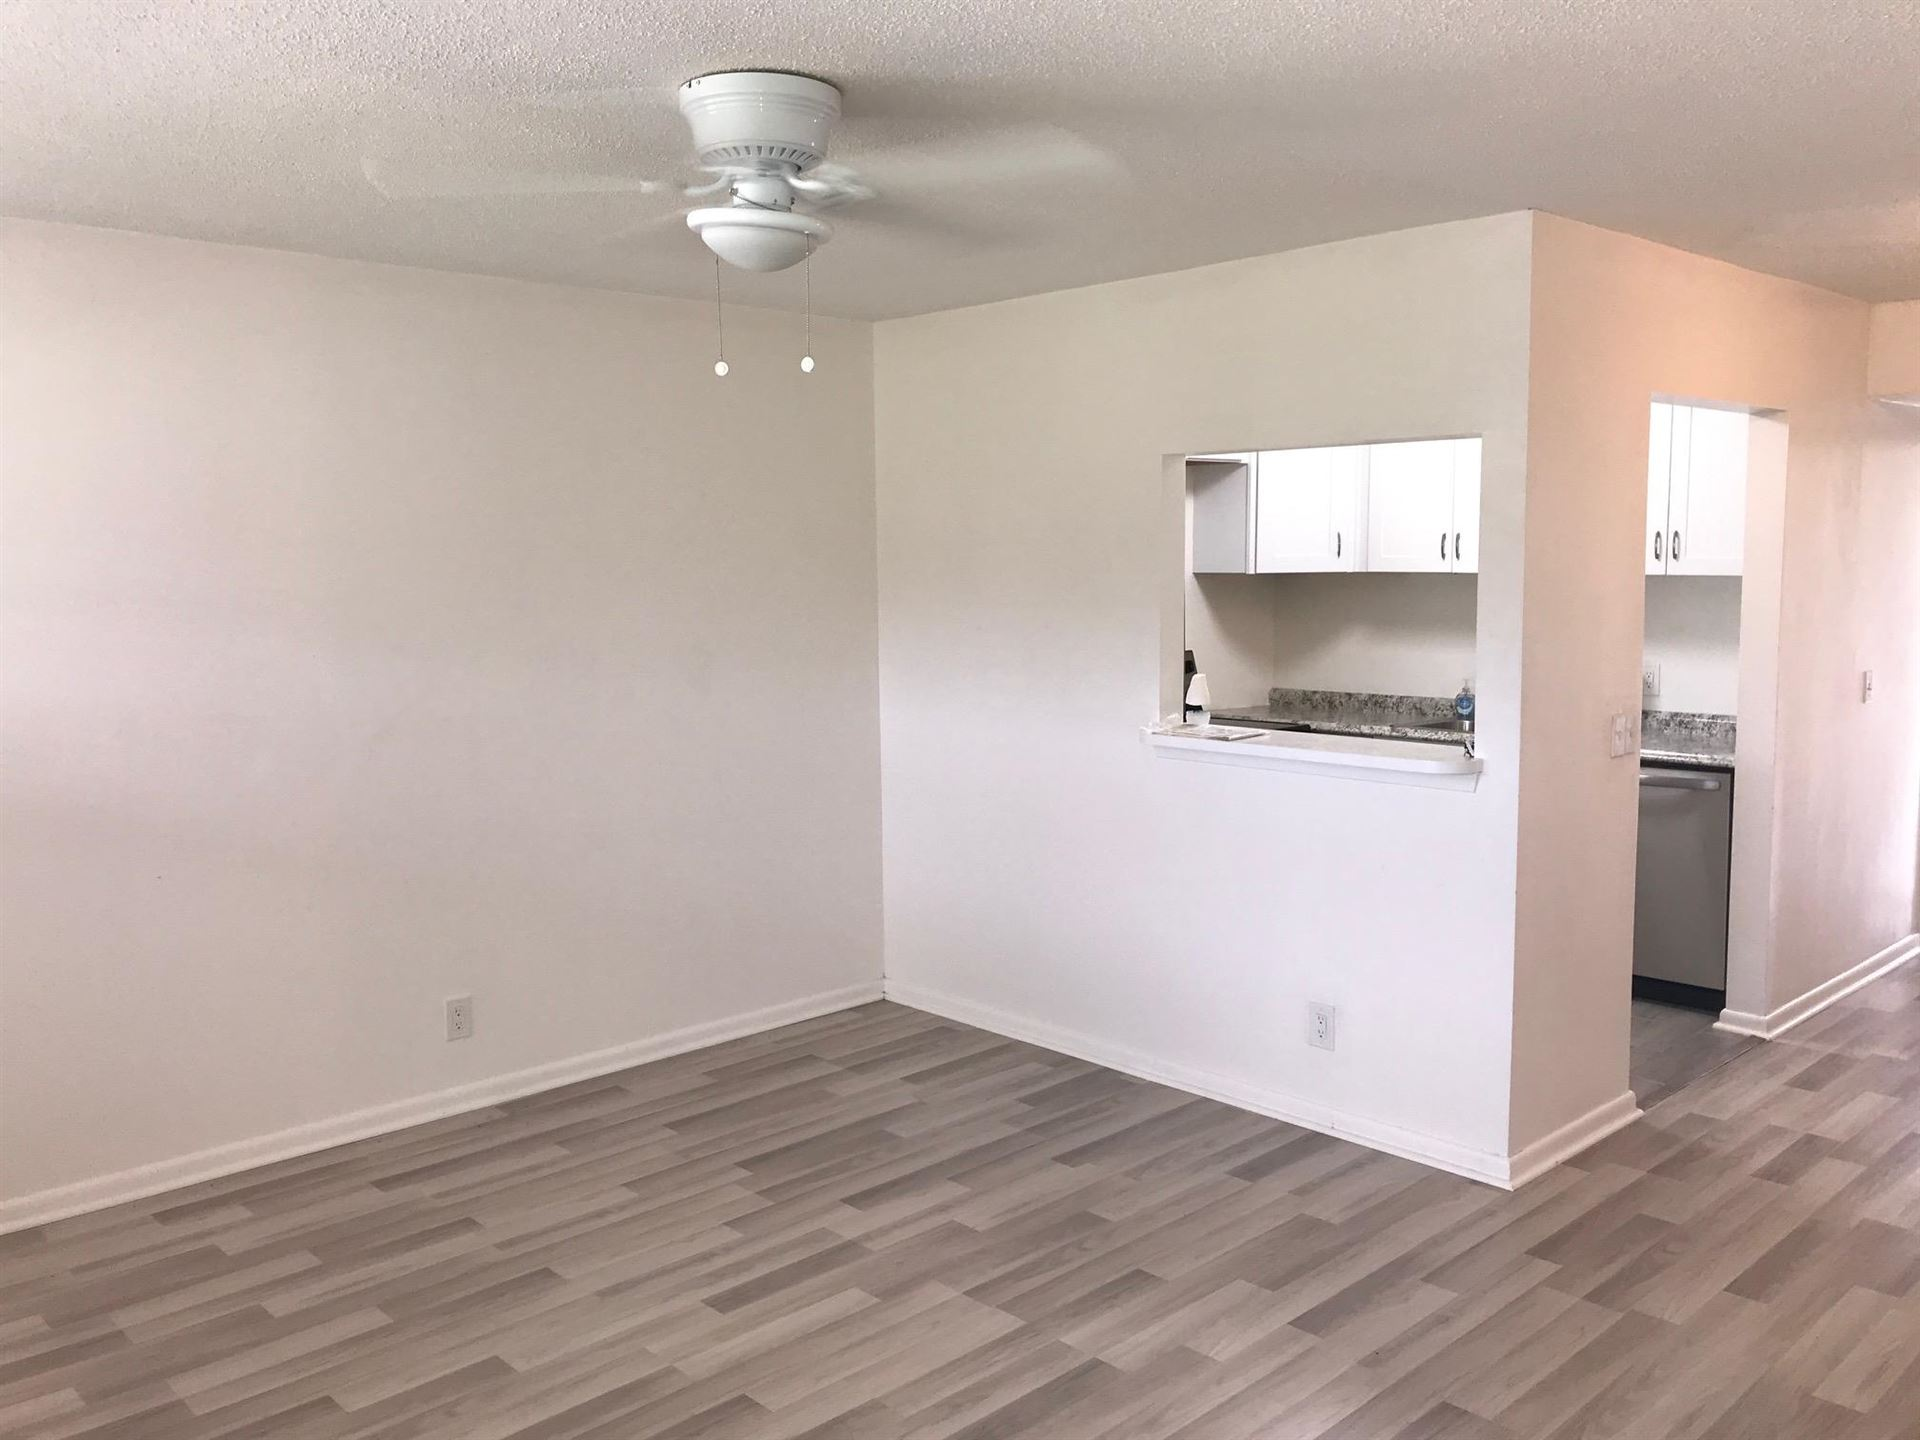 207 Dorchester I, West Palm Beach, FL 33417 - MLS#: RX-10648040